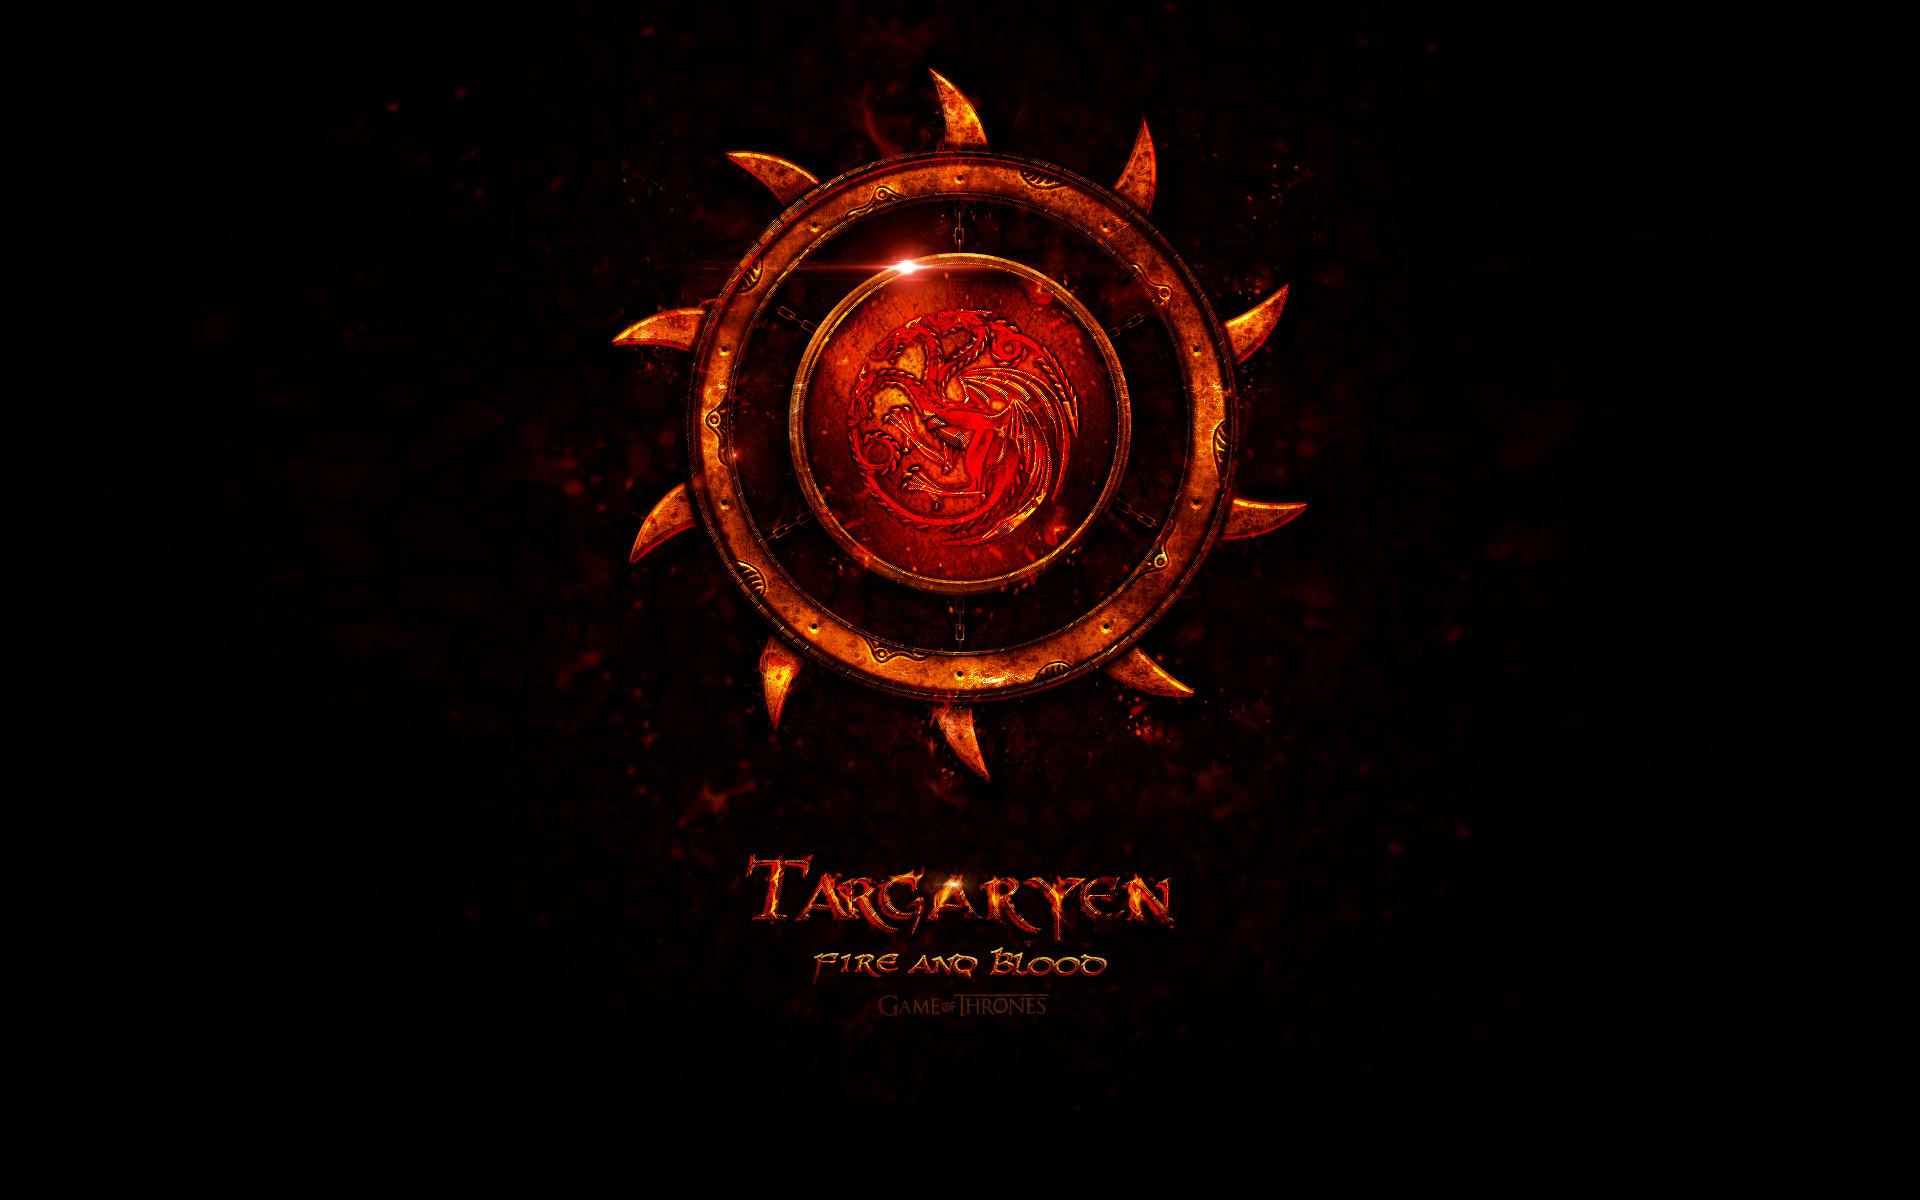 … Game of Thrones Targaryen wallpaeper by jjfwh